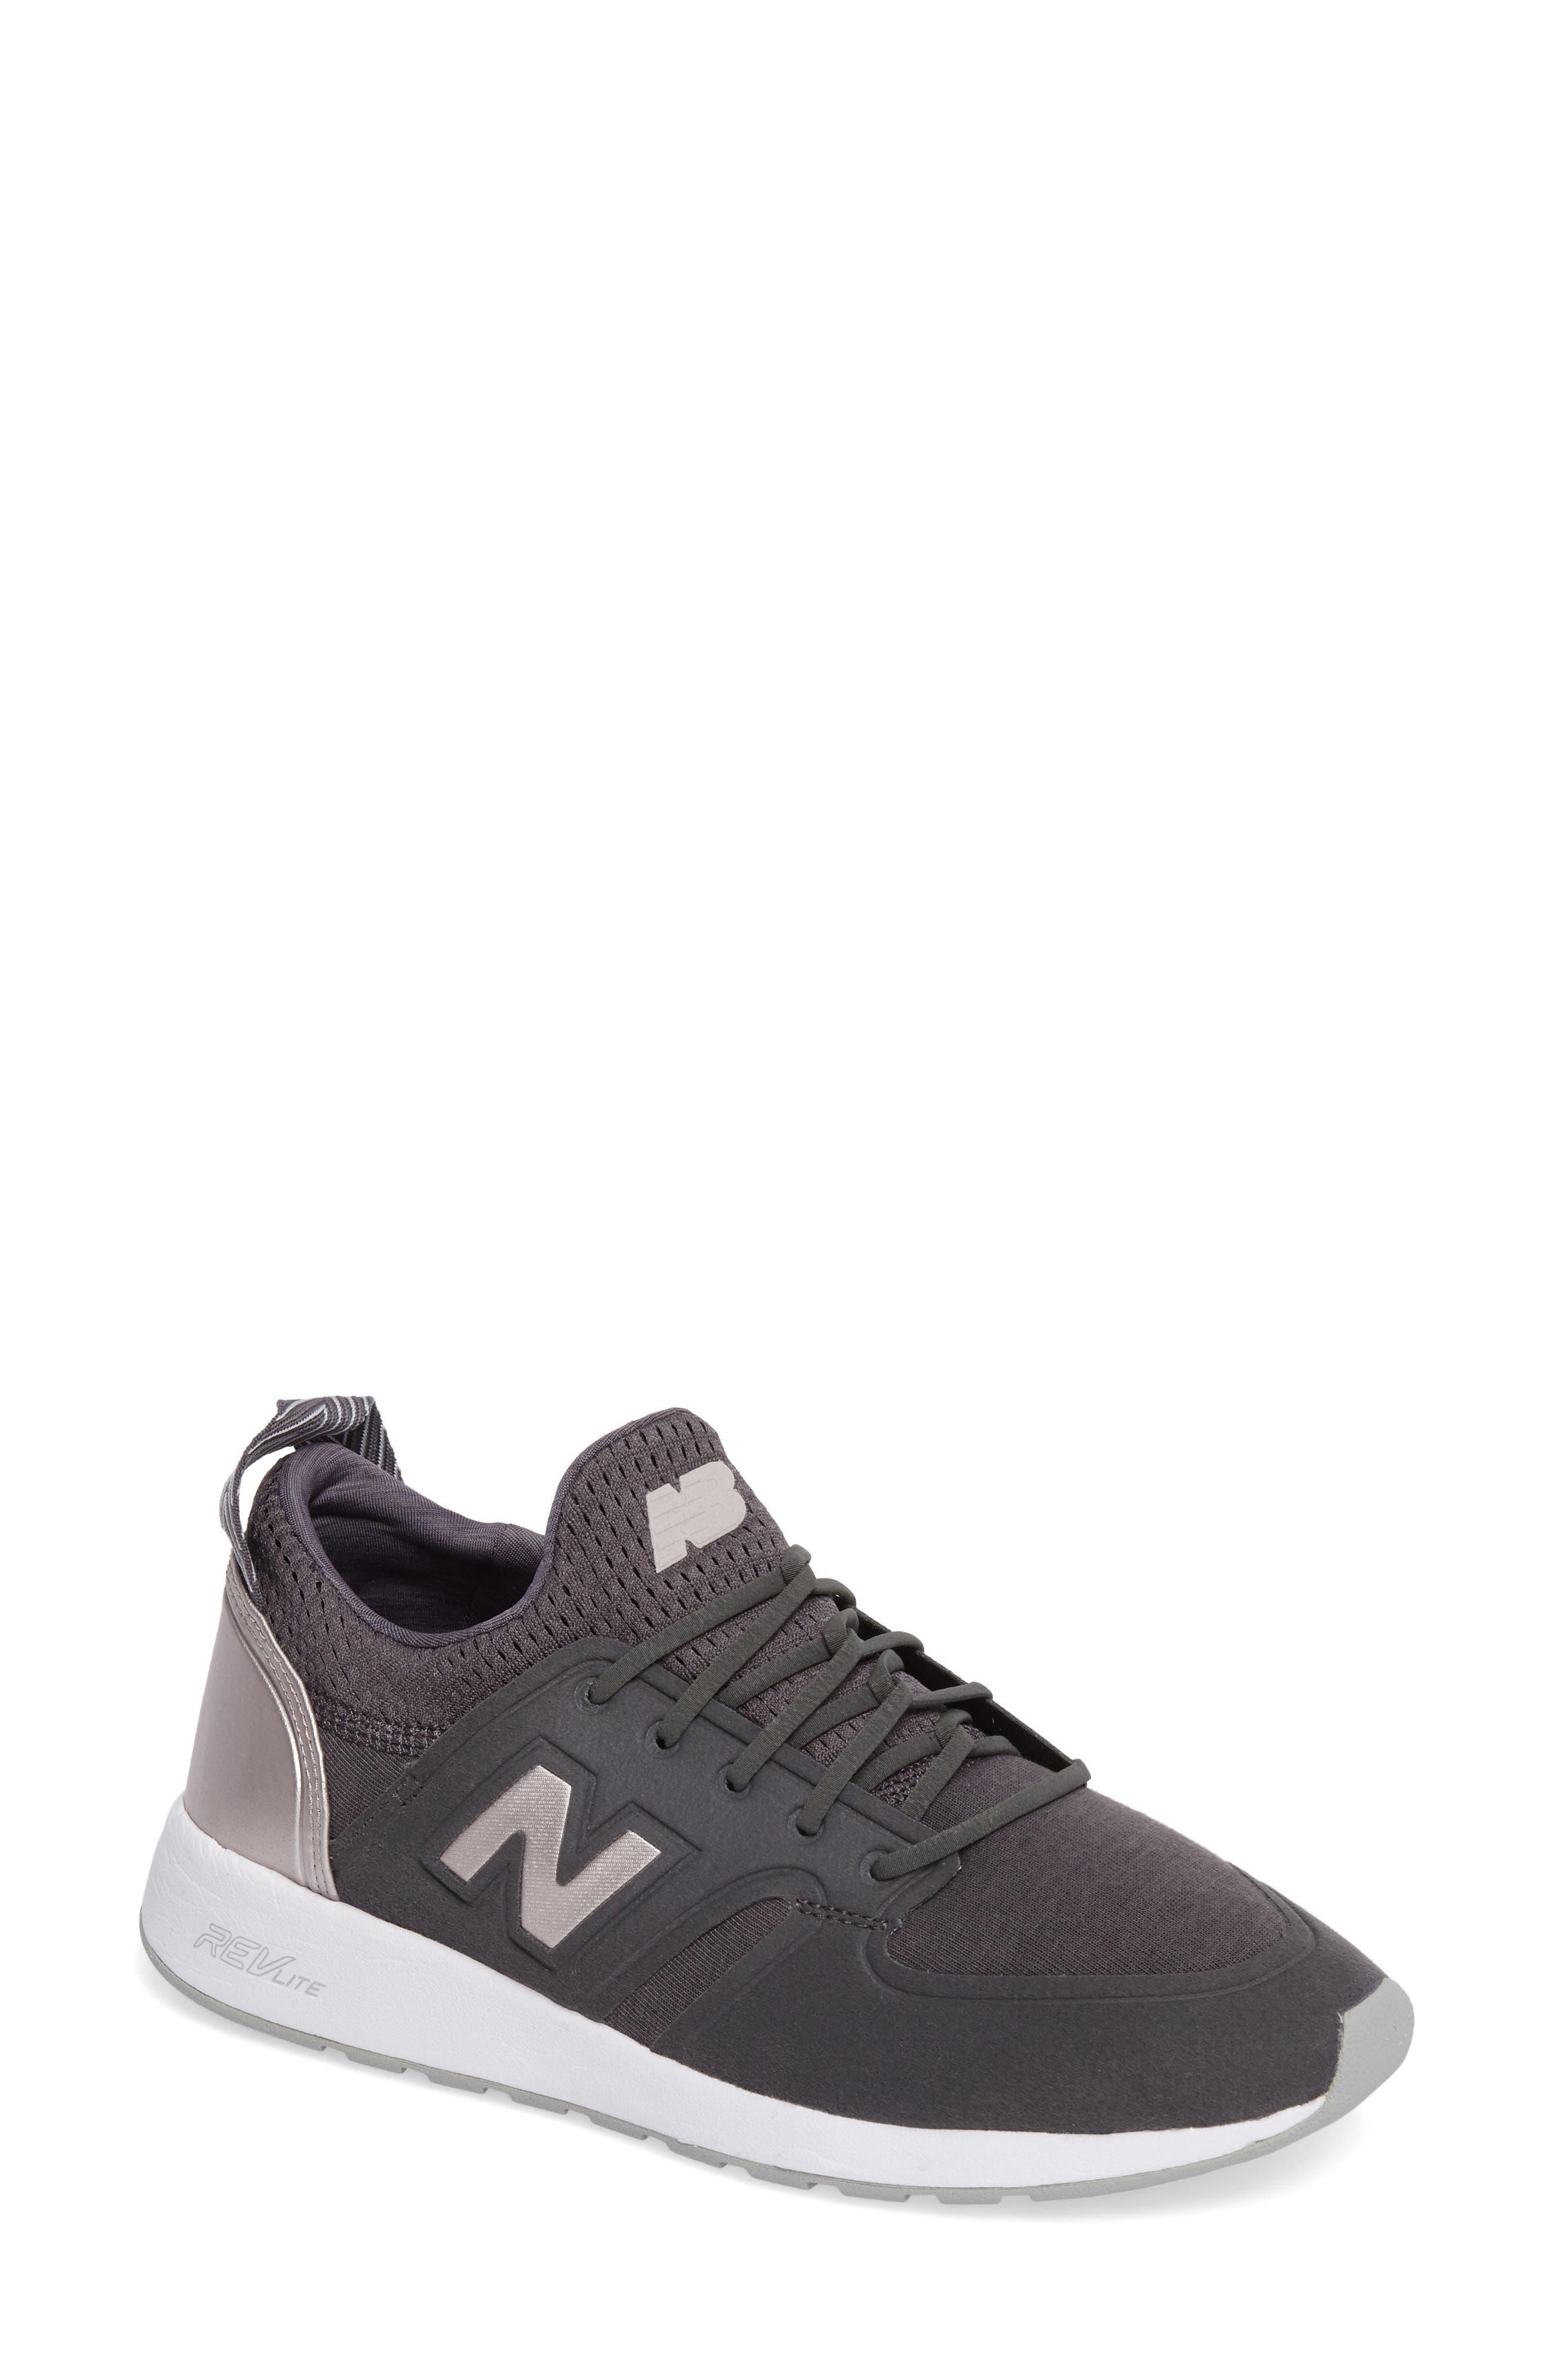 '420' Sneaker,                             Main thumbnail 1, color,                             021